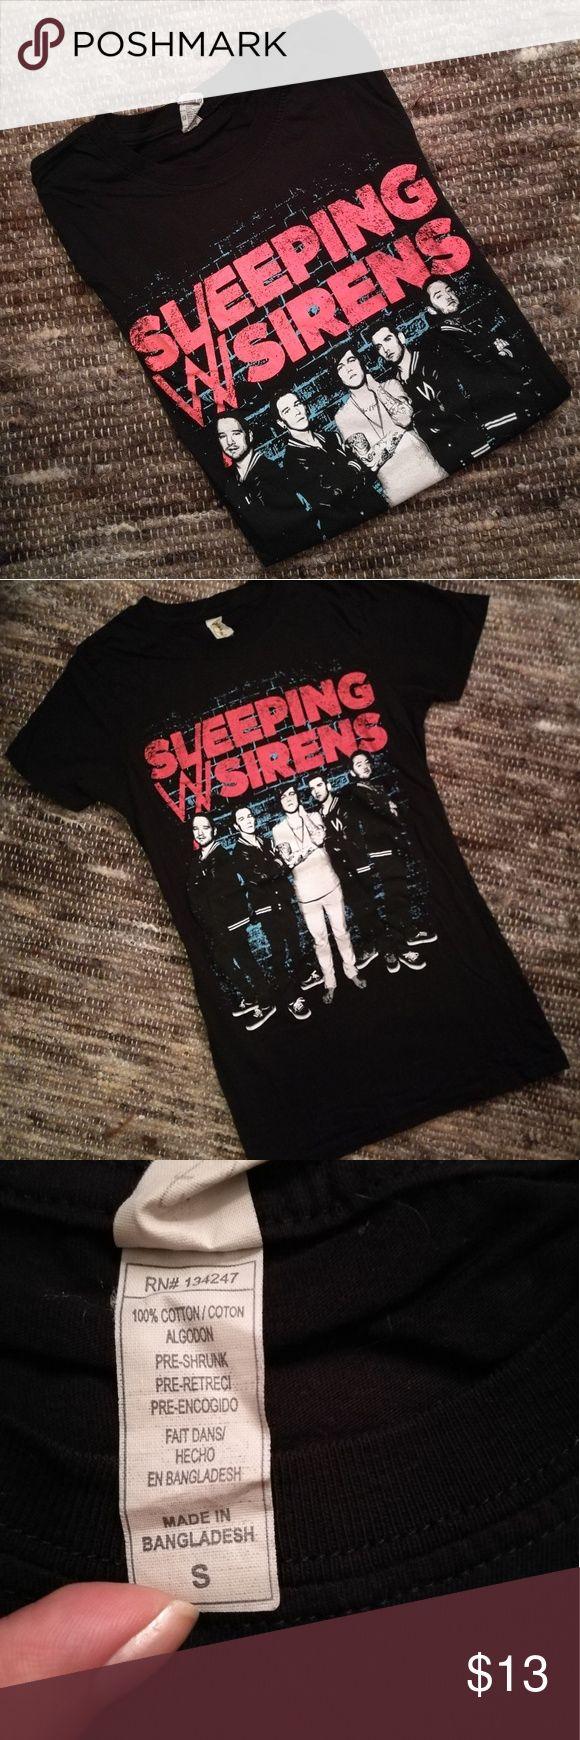 Black keys t shirt uk - Sleeping With Sirens Band T Shirt